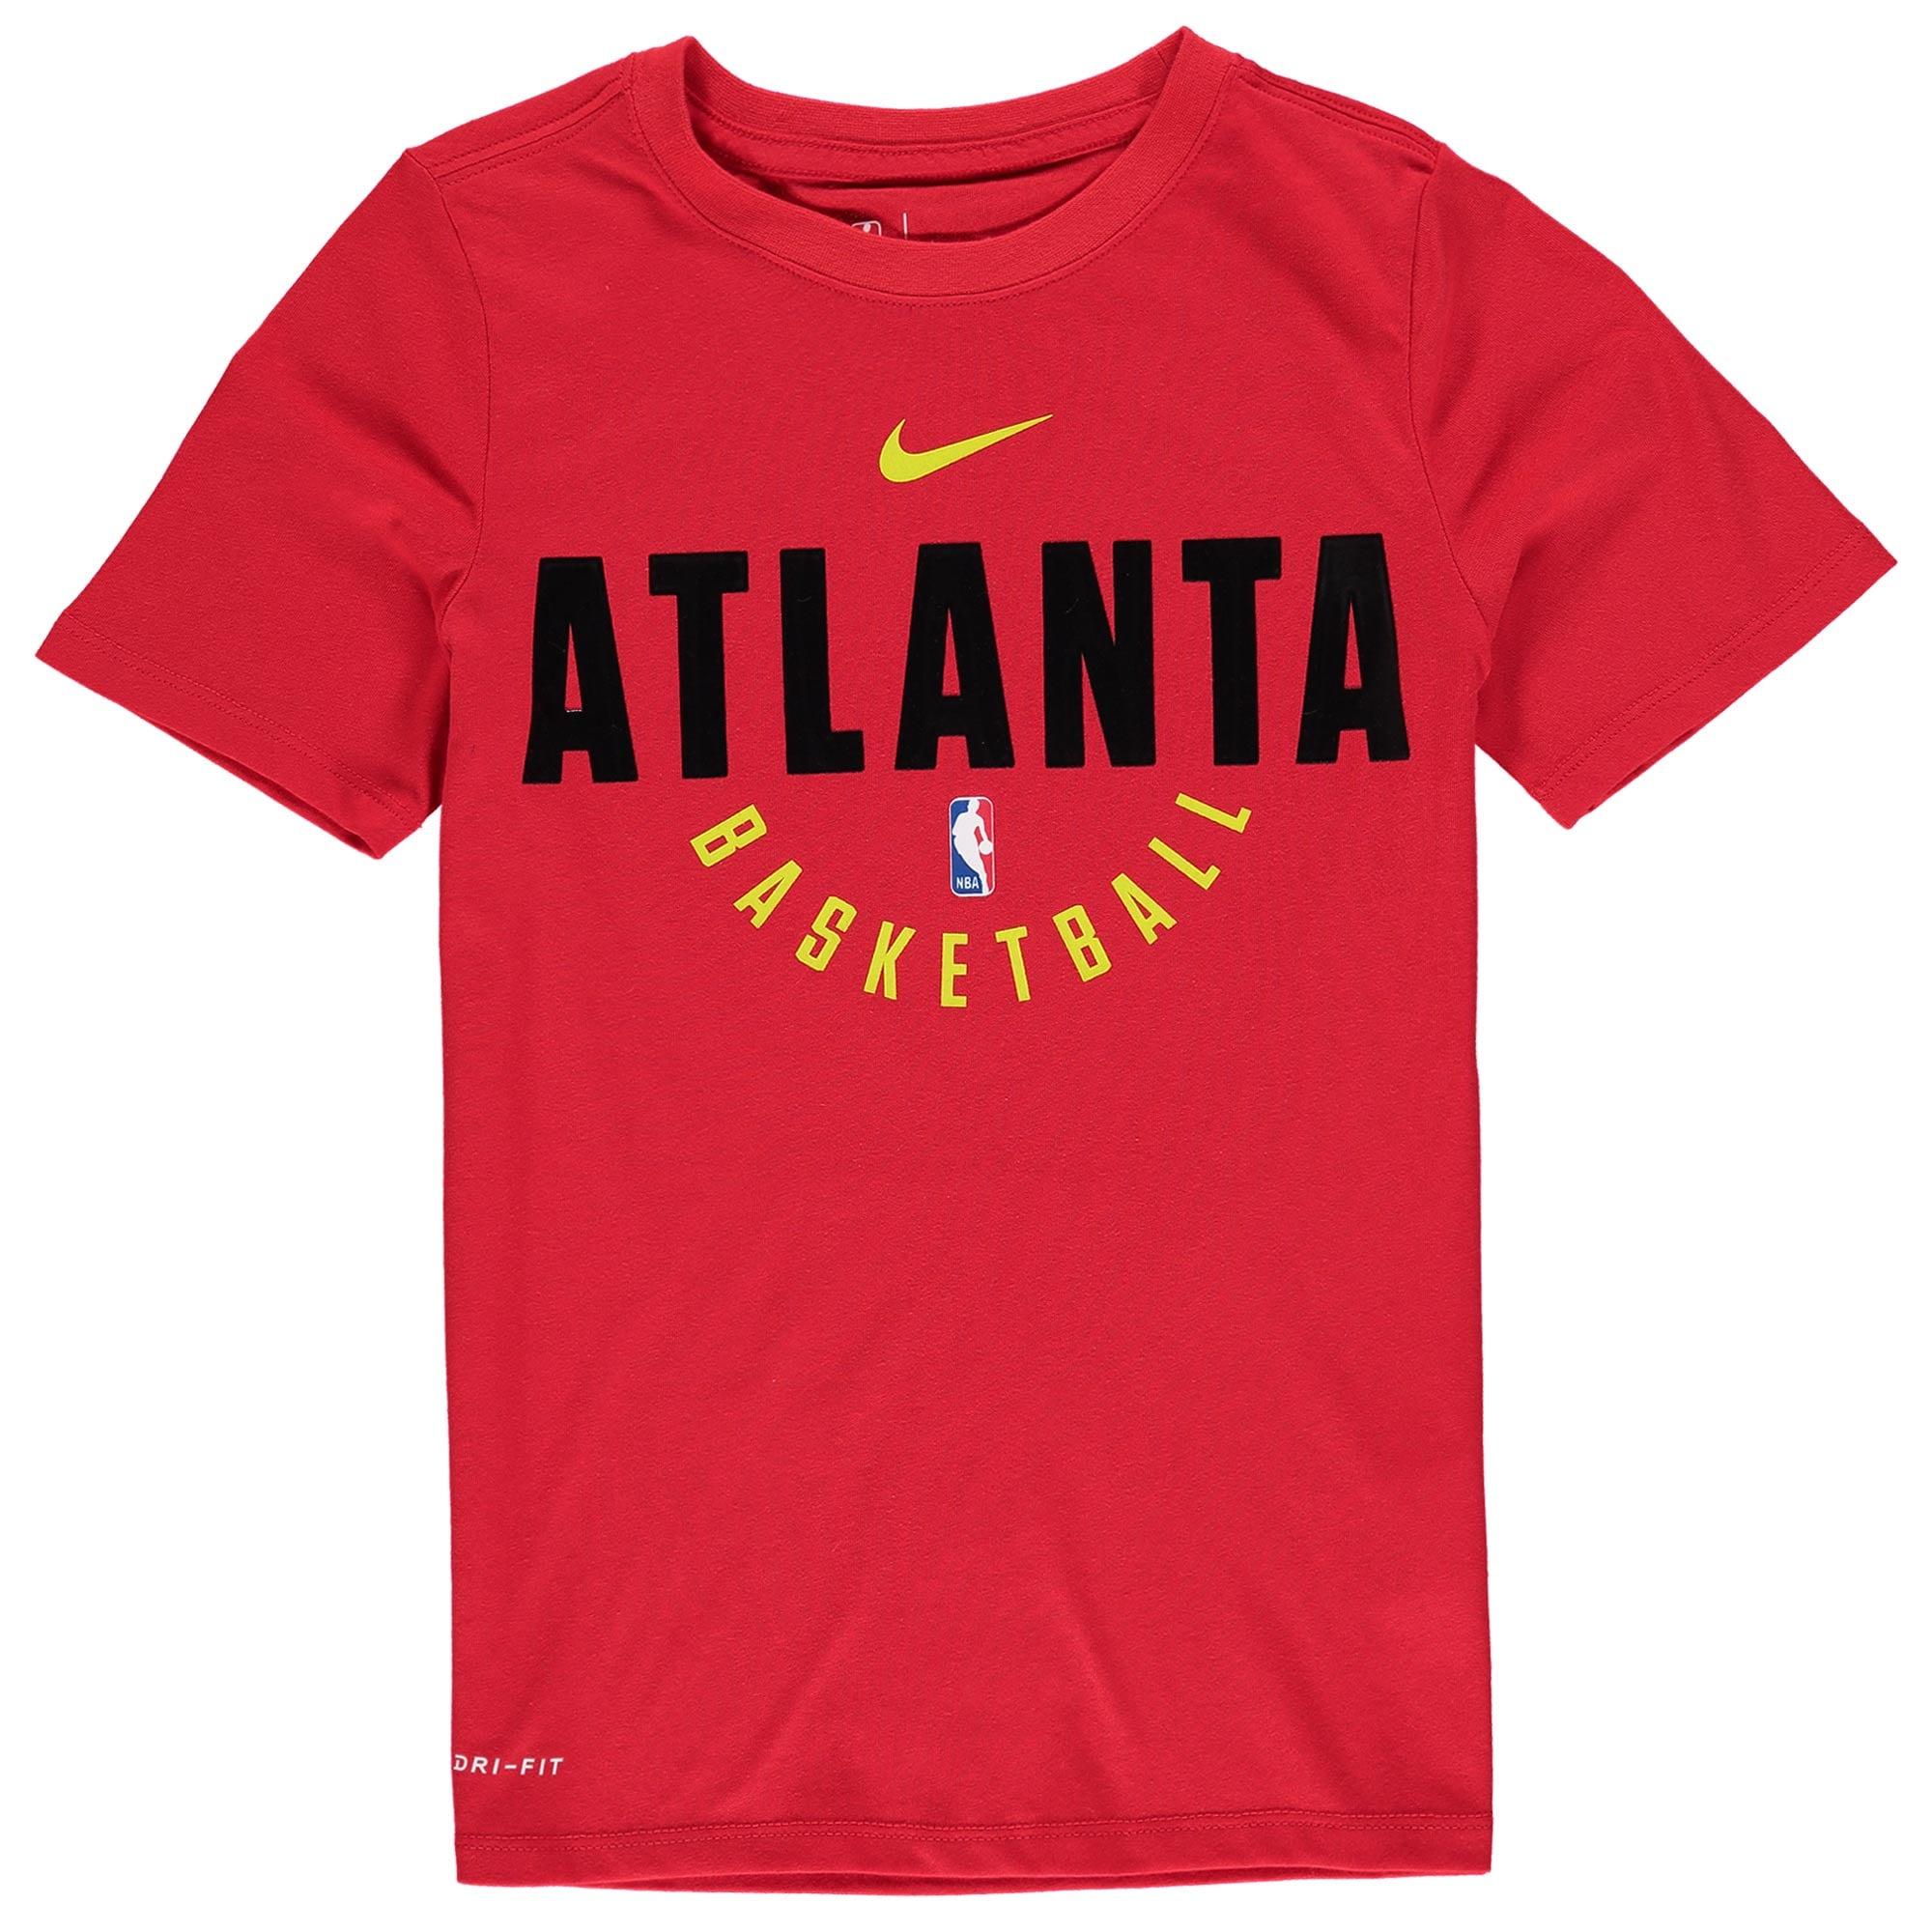 Atlanta Hawks Nike Youth Elite Practice Performance T-Shirt - Red